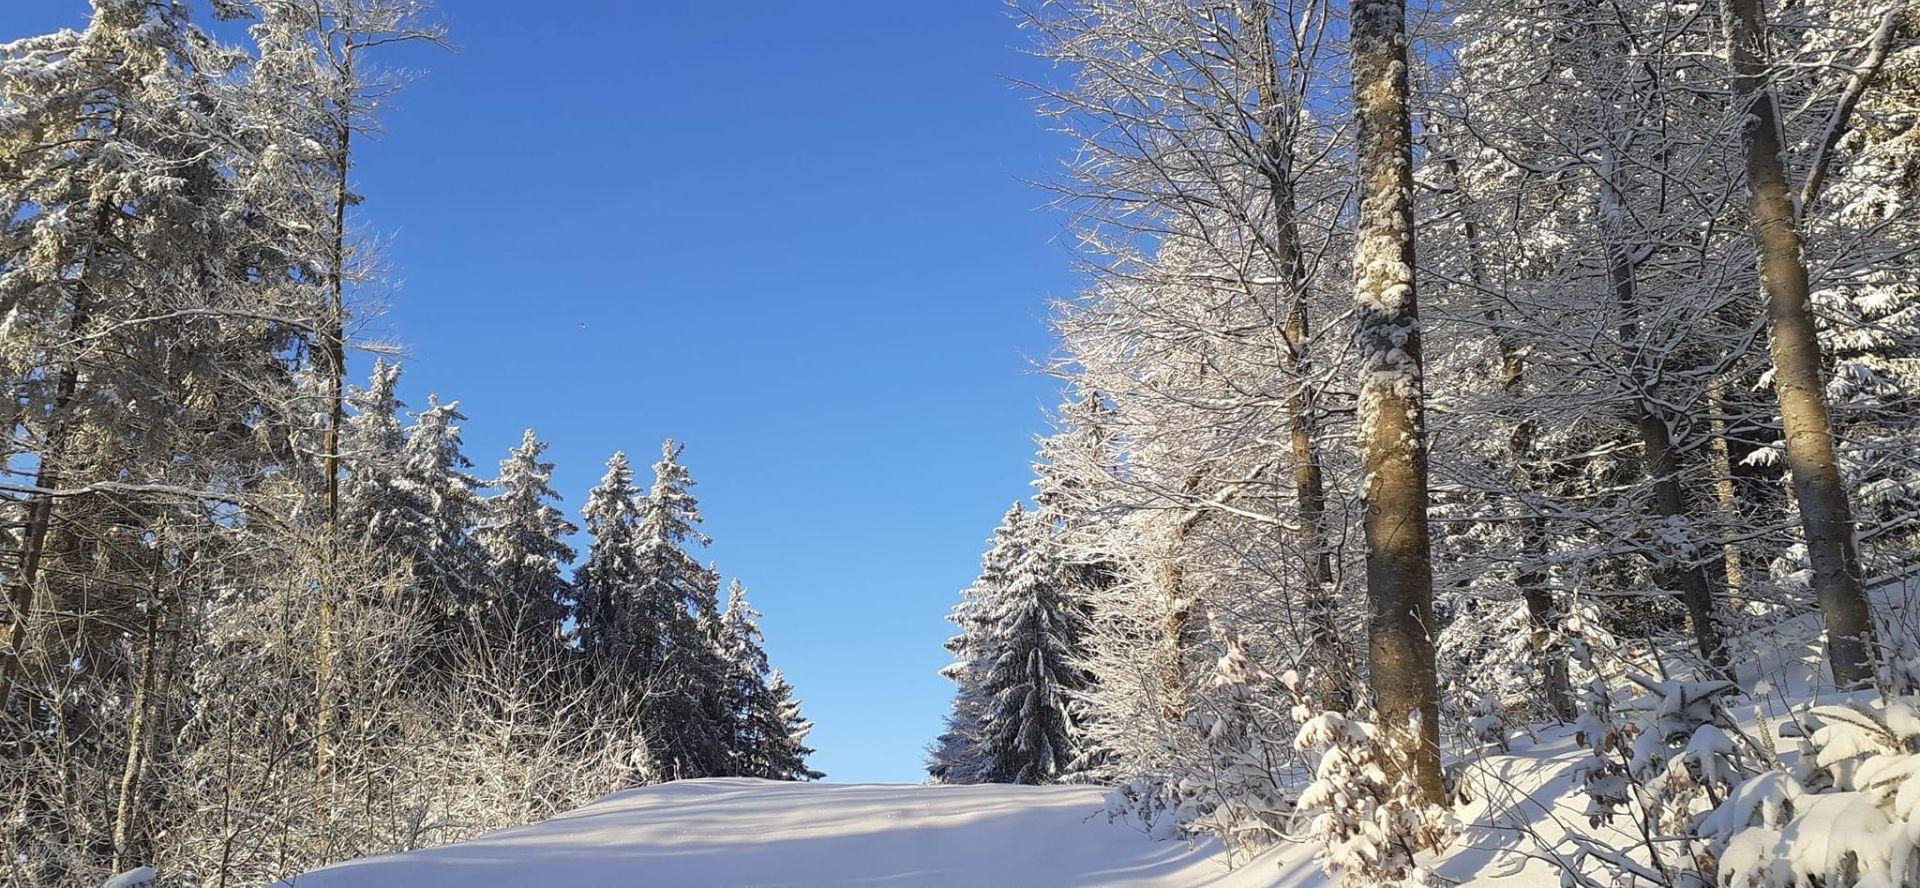 The Bagenelles ski resort